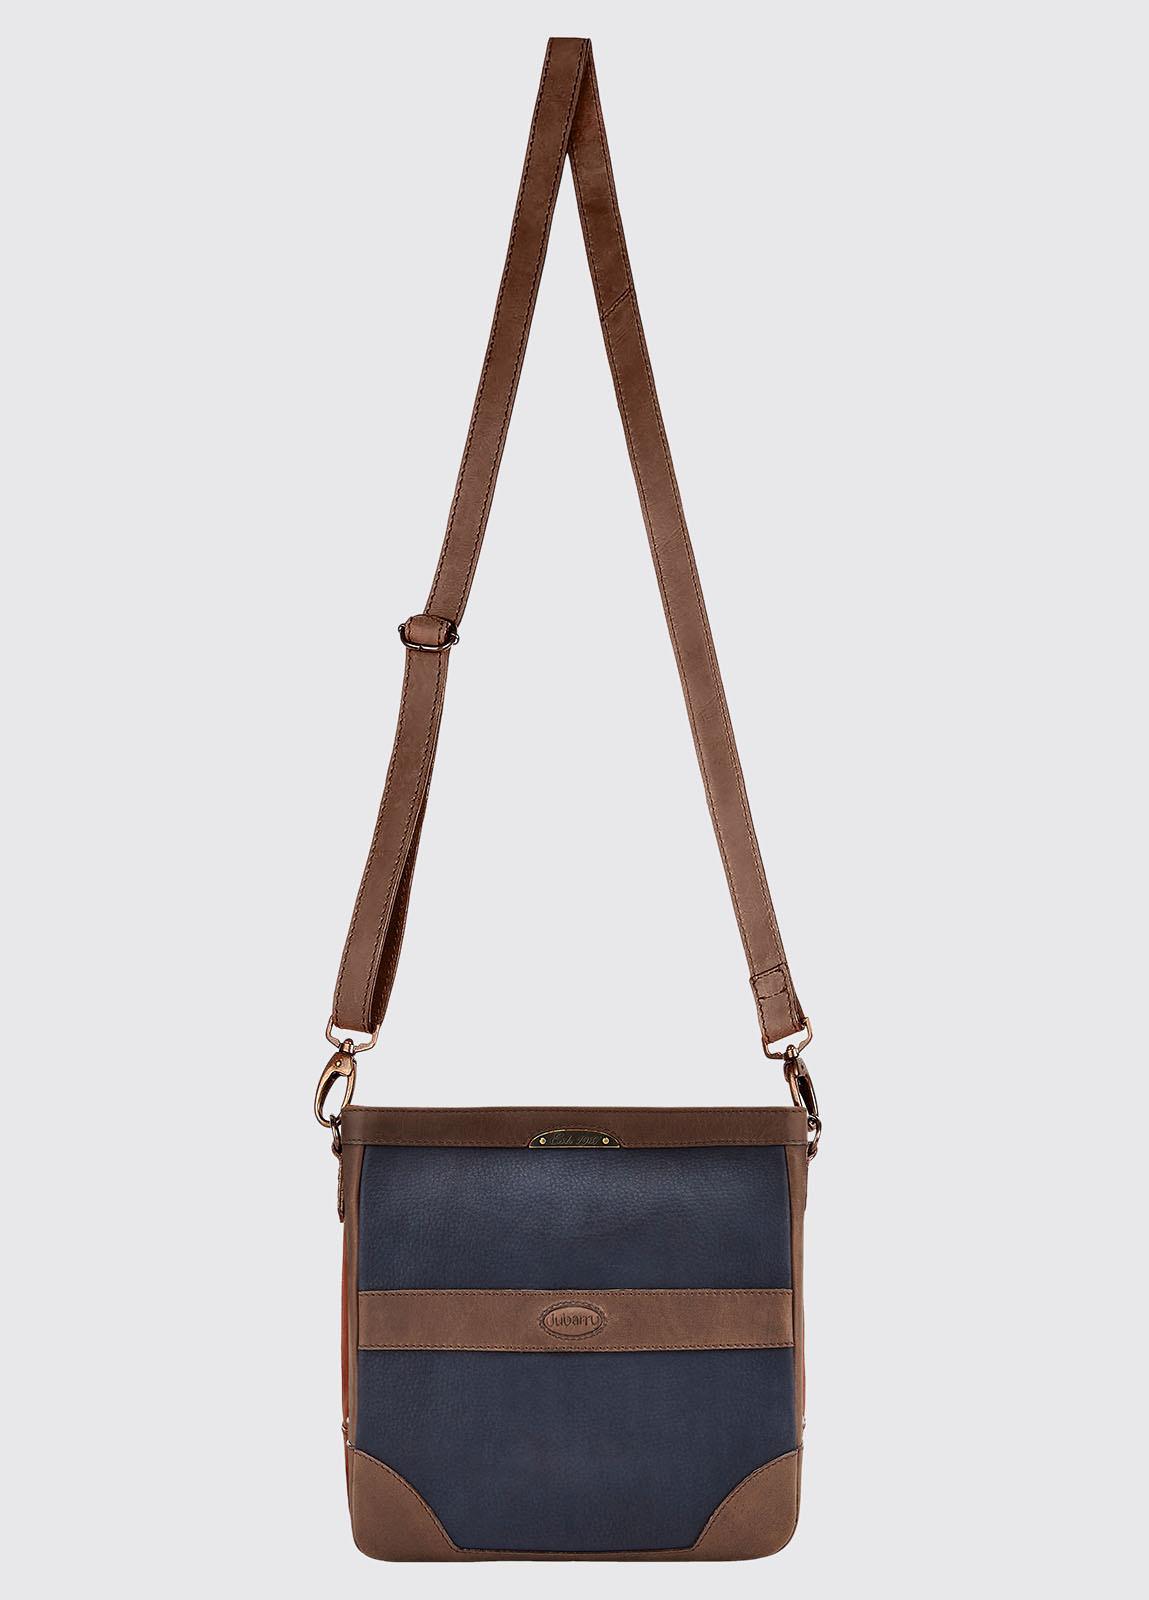 Ardmore Cross Body Bag - Navy/Brown